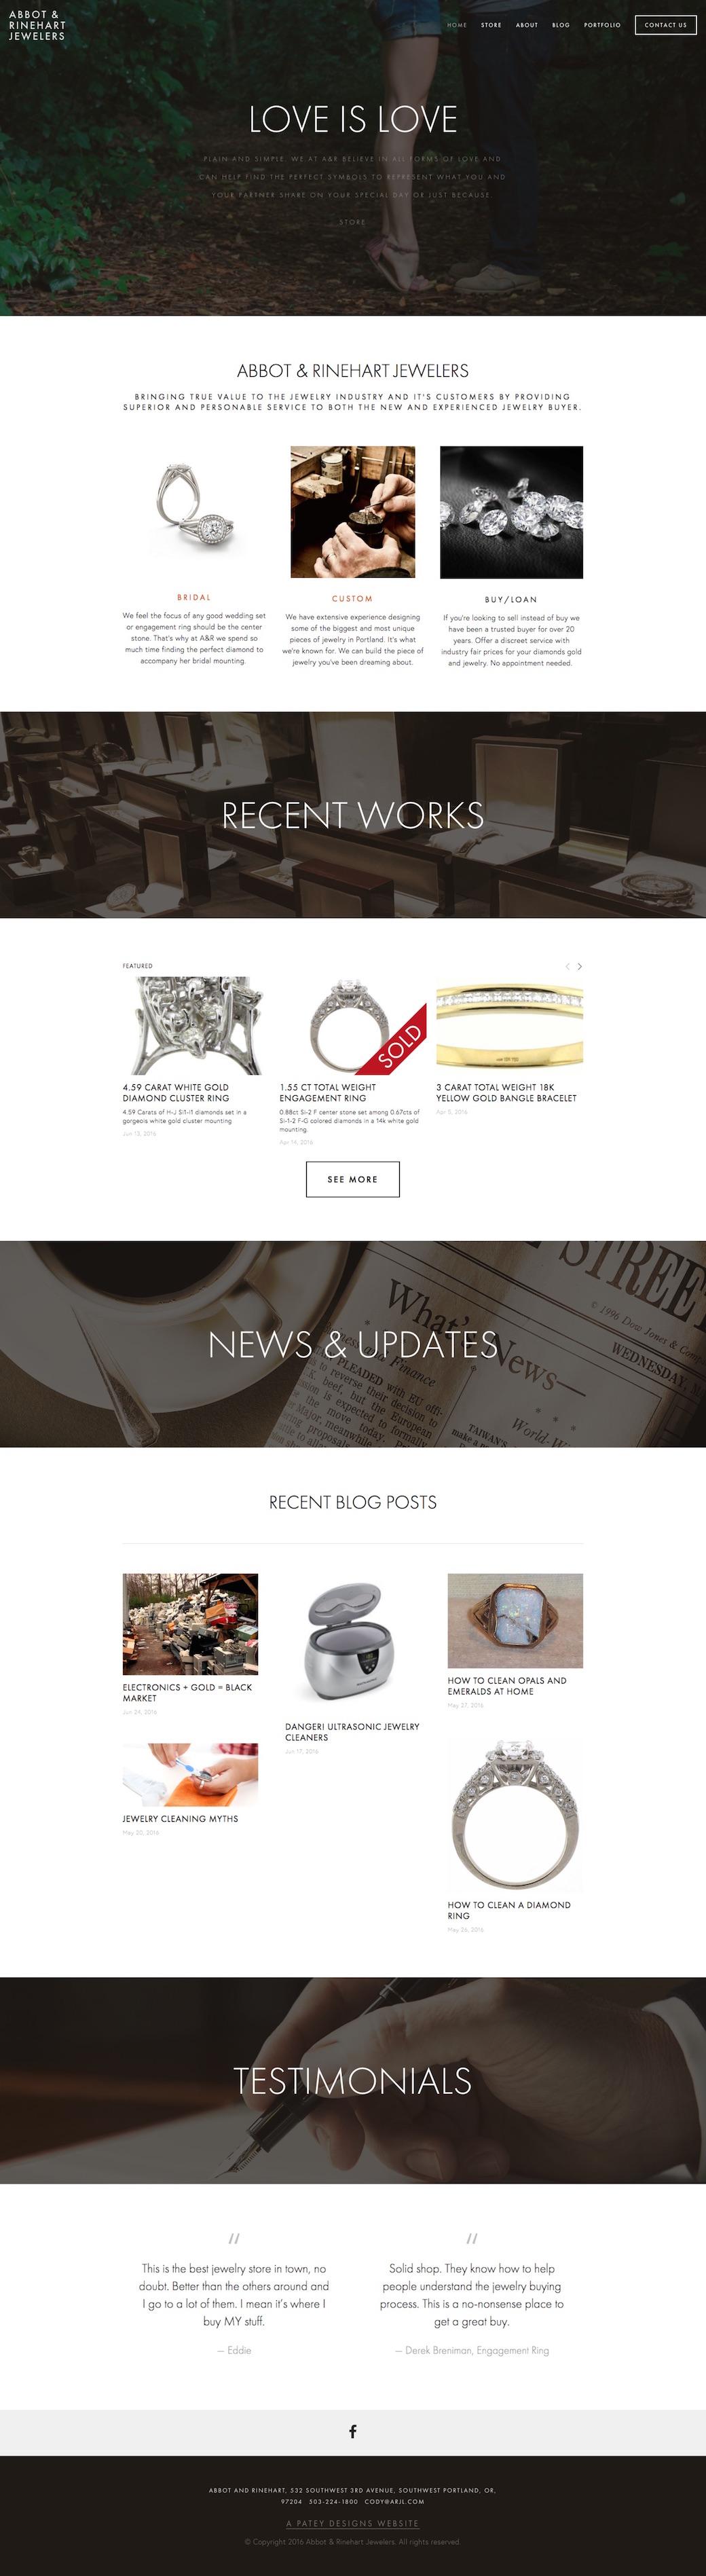 ARJL jewelry e-commerce website built by Patey Designs Portland Oregon